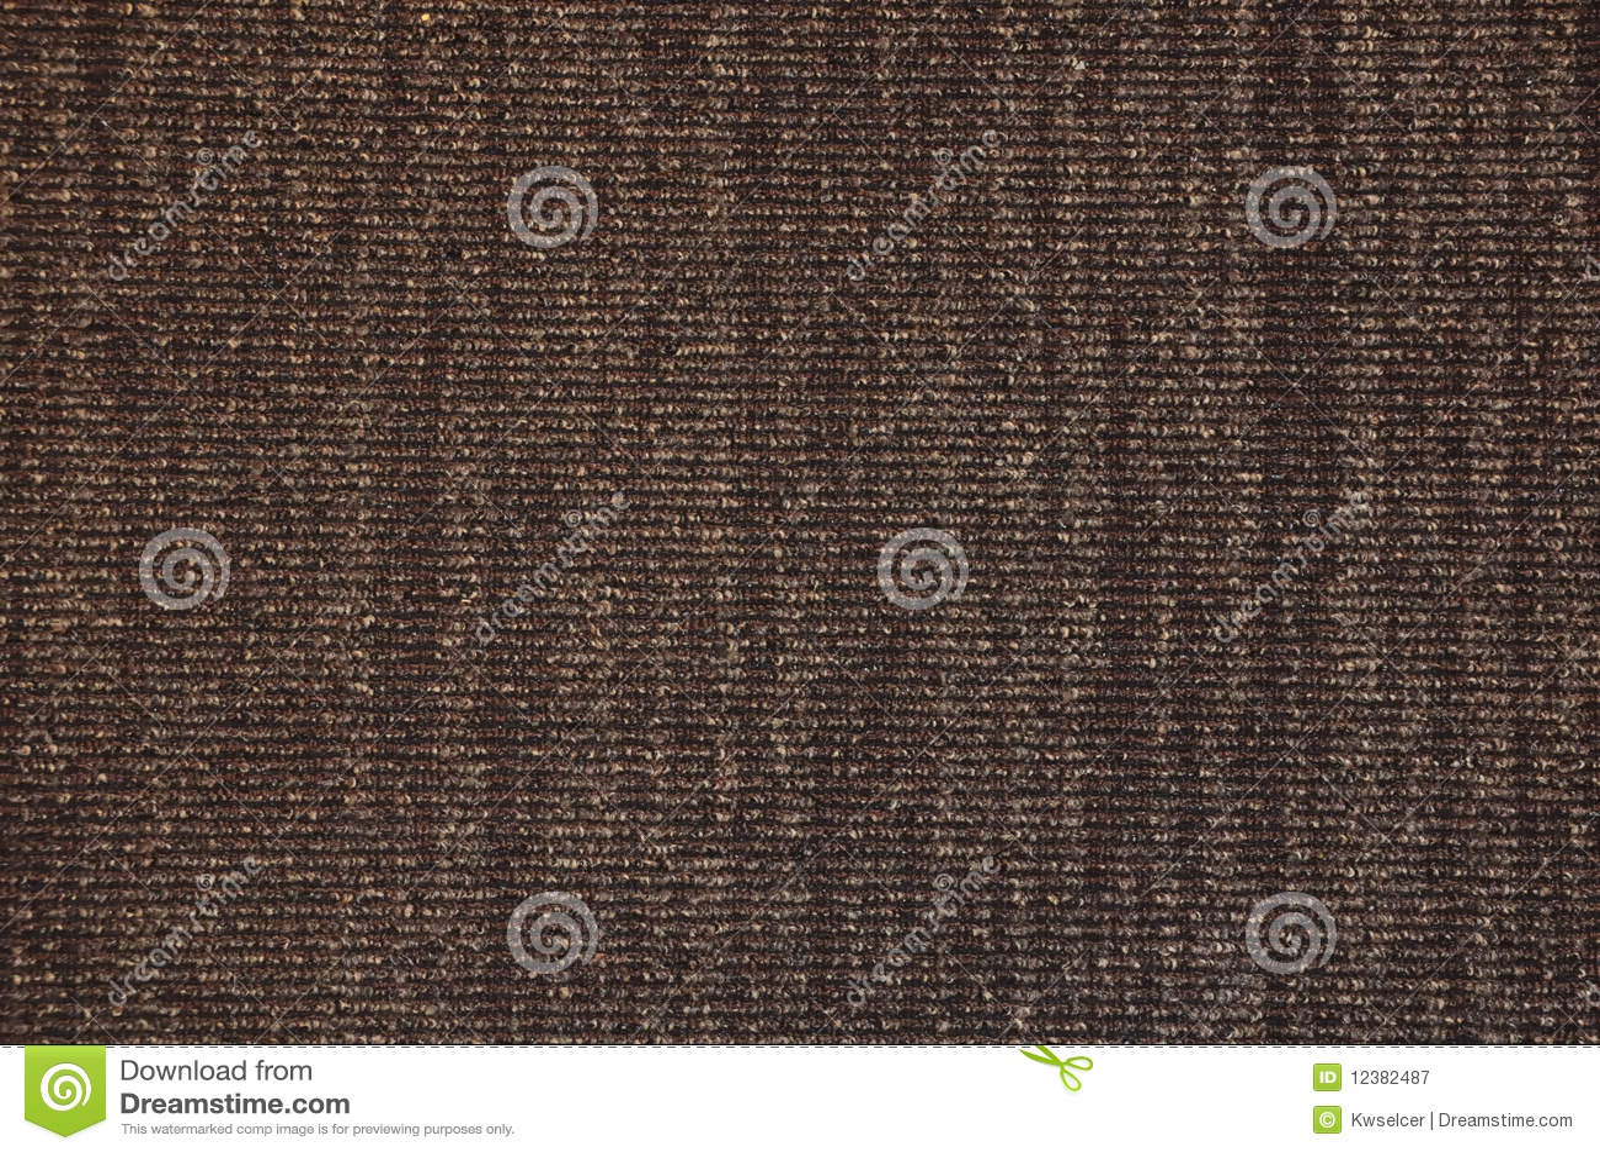 Brown Textured Carpet Pattern